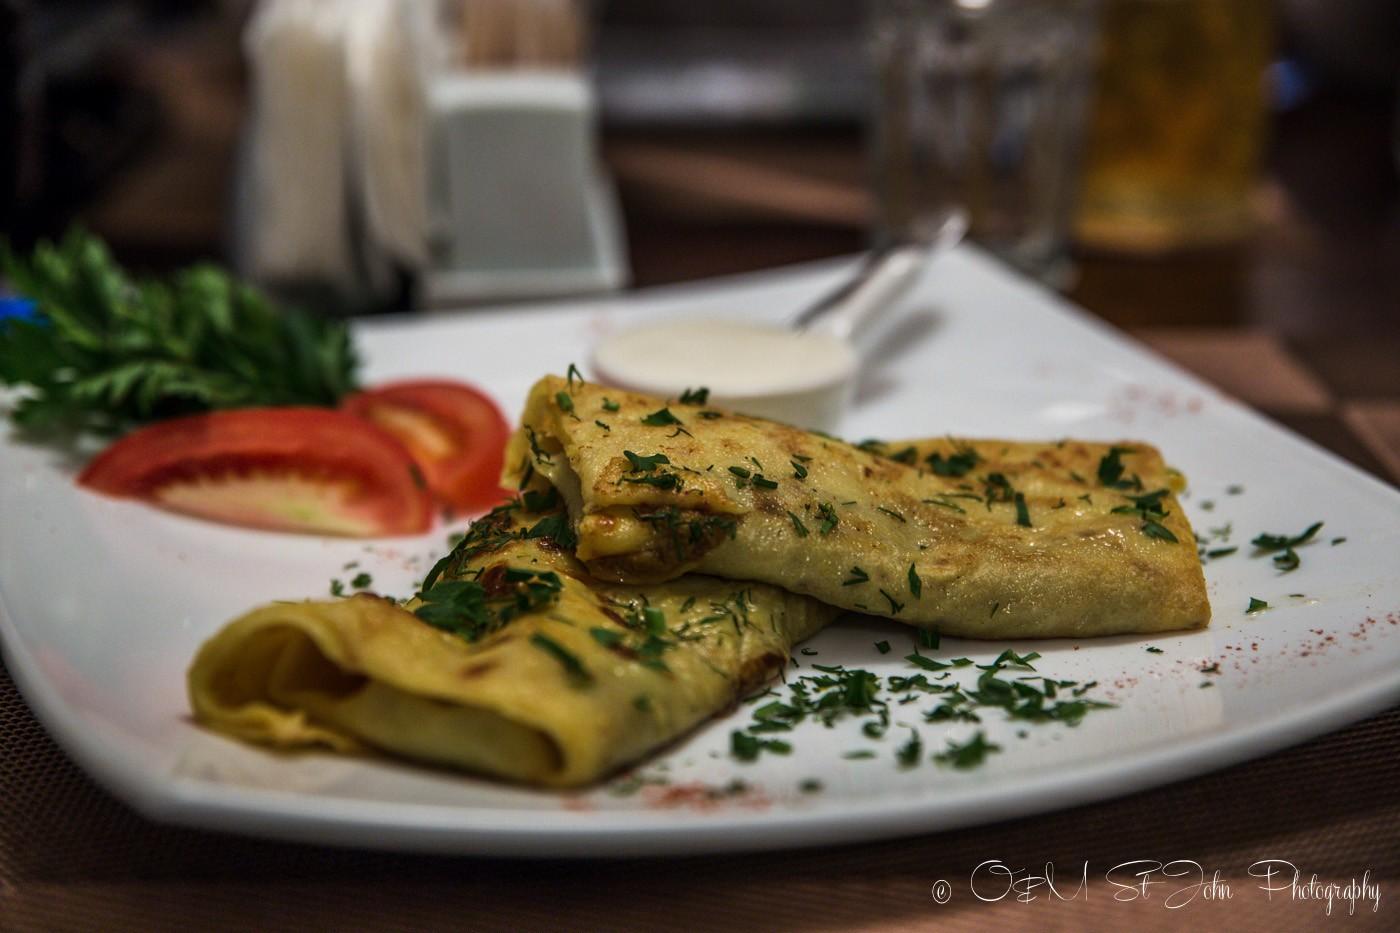 Blinchiki, Ukrainian food, crepes filled with meat. Ukraine